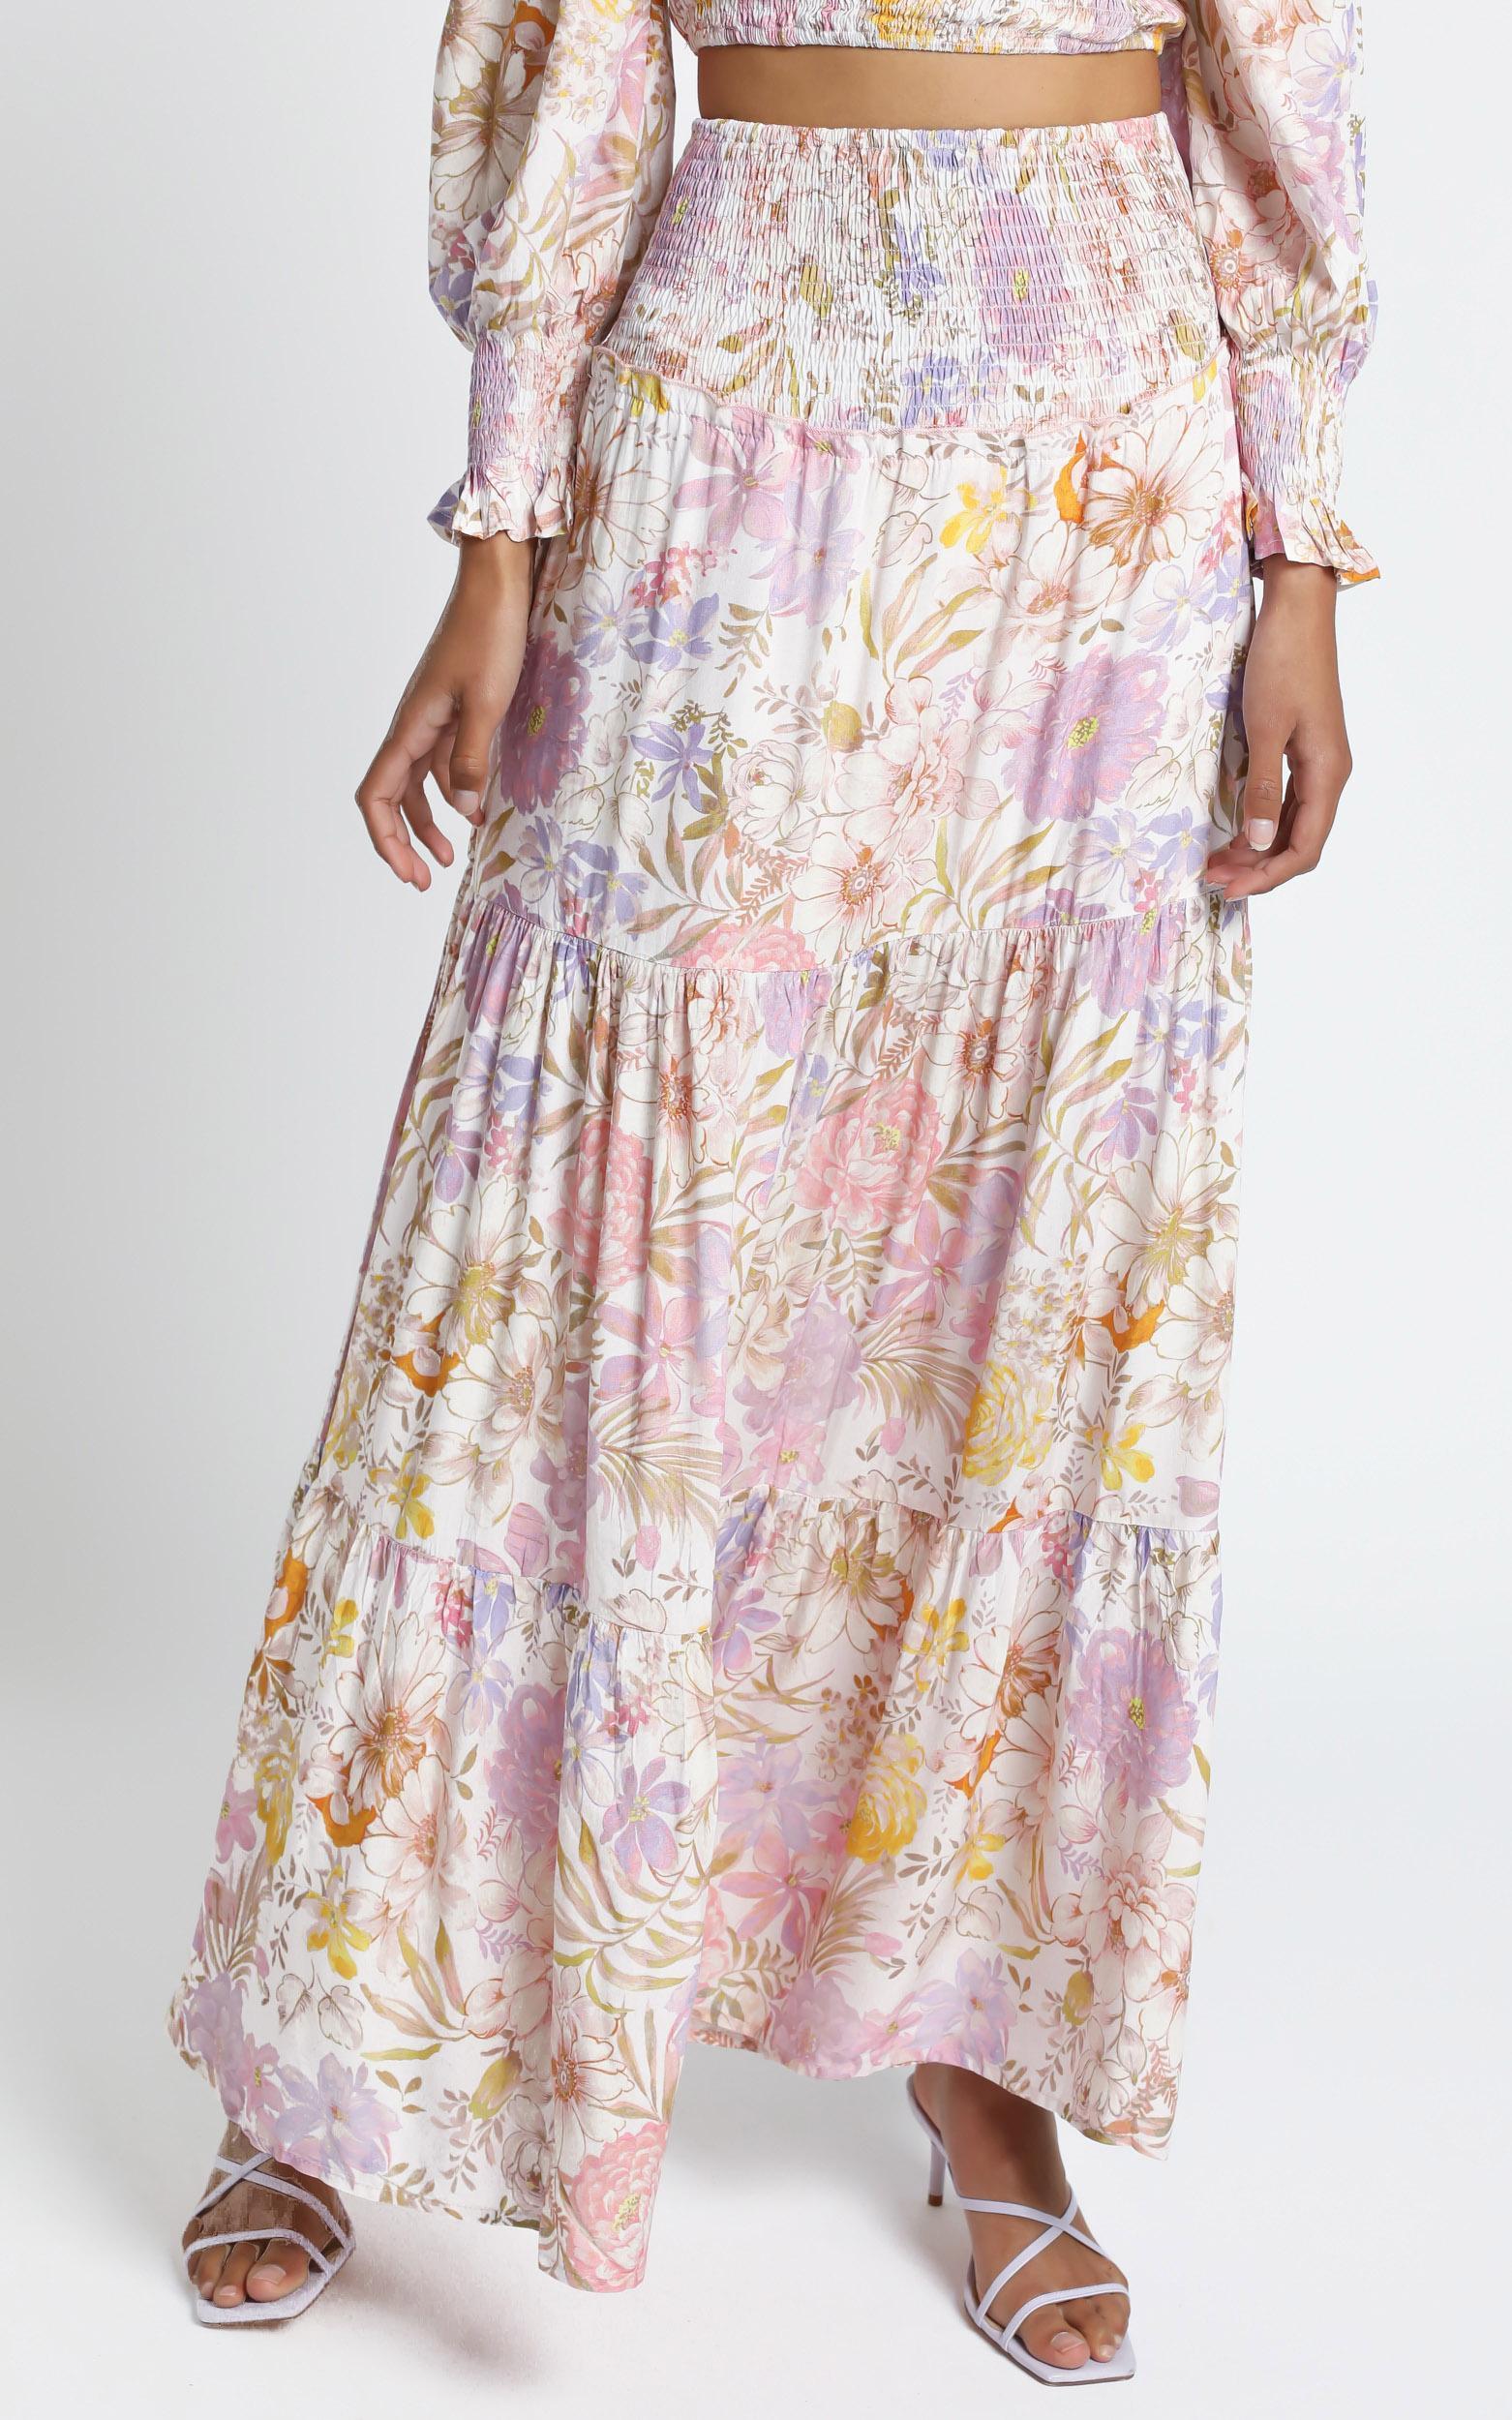 Autumn Skirt in Vintage Floral - 14 (XL), Cream, hi-res image number null